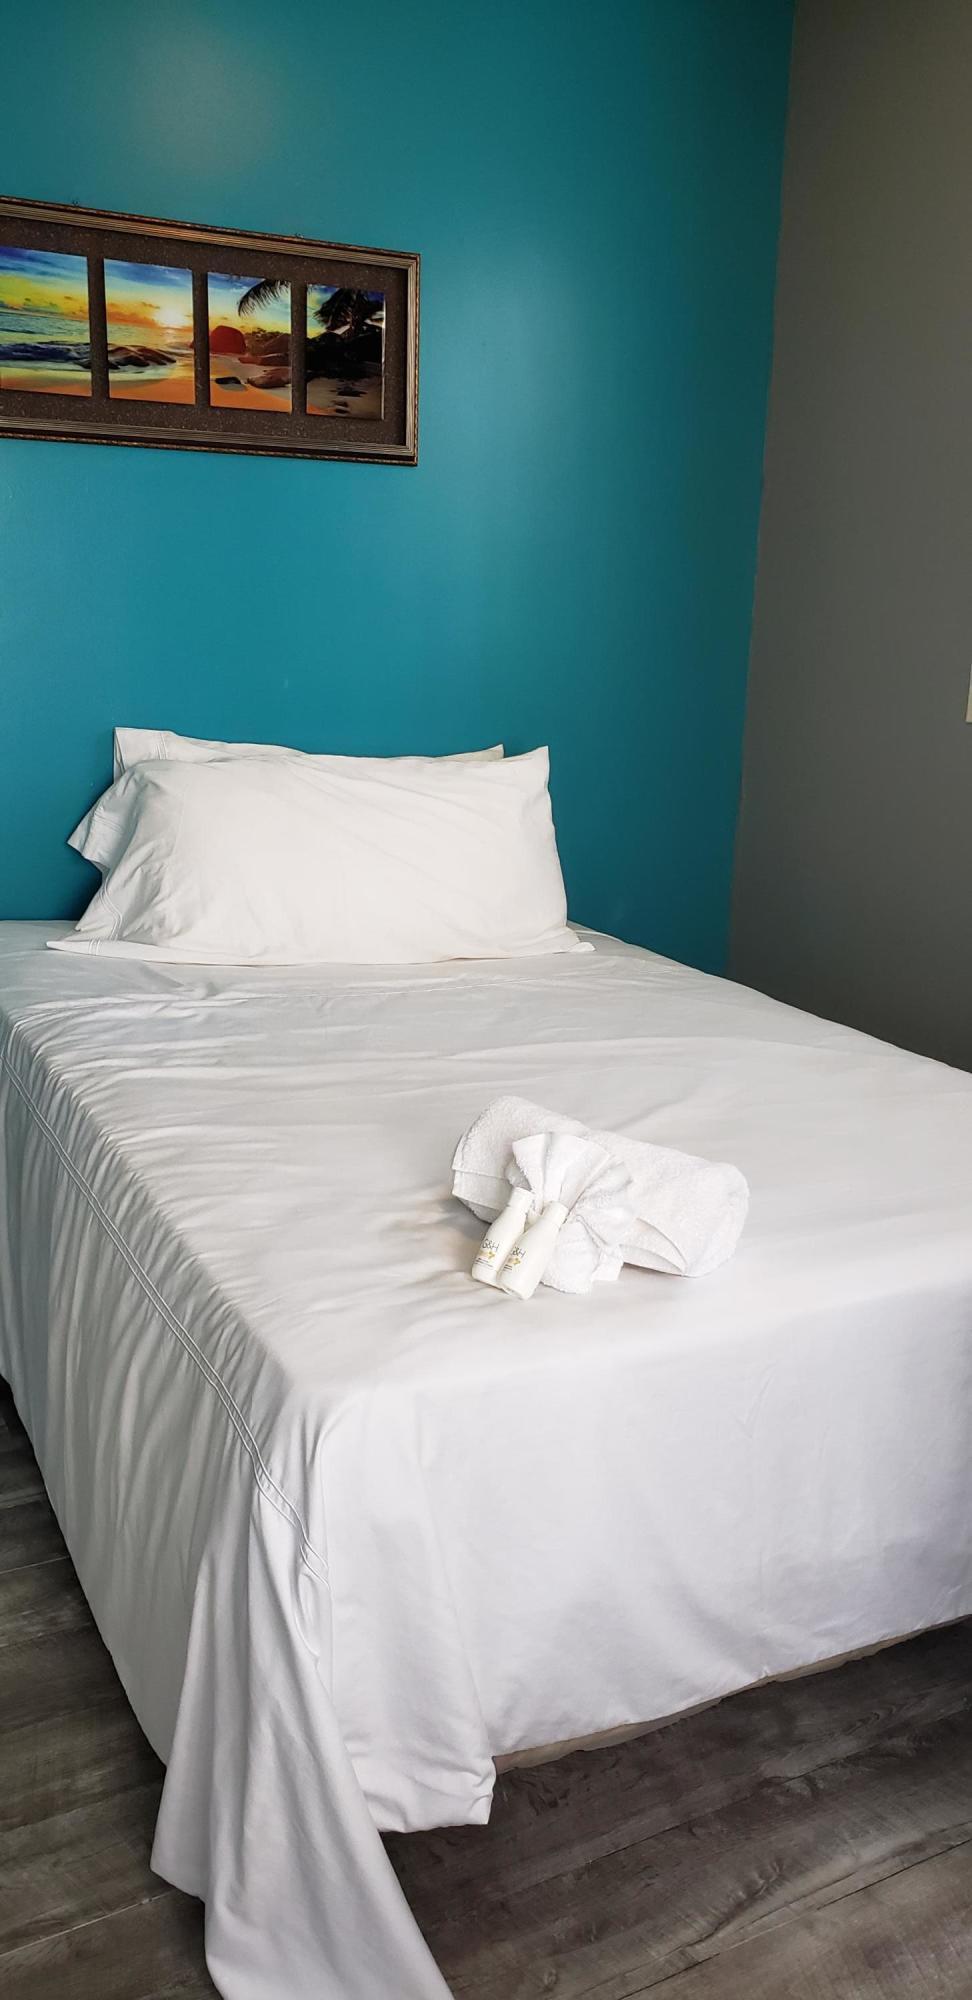 Bed w Artwork Flrs